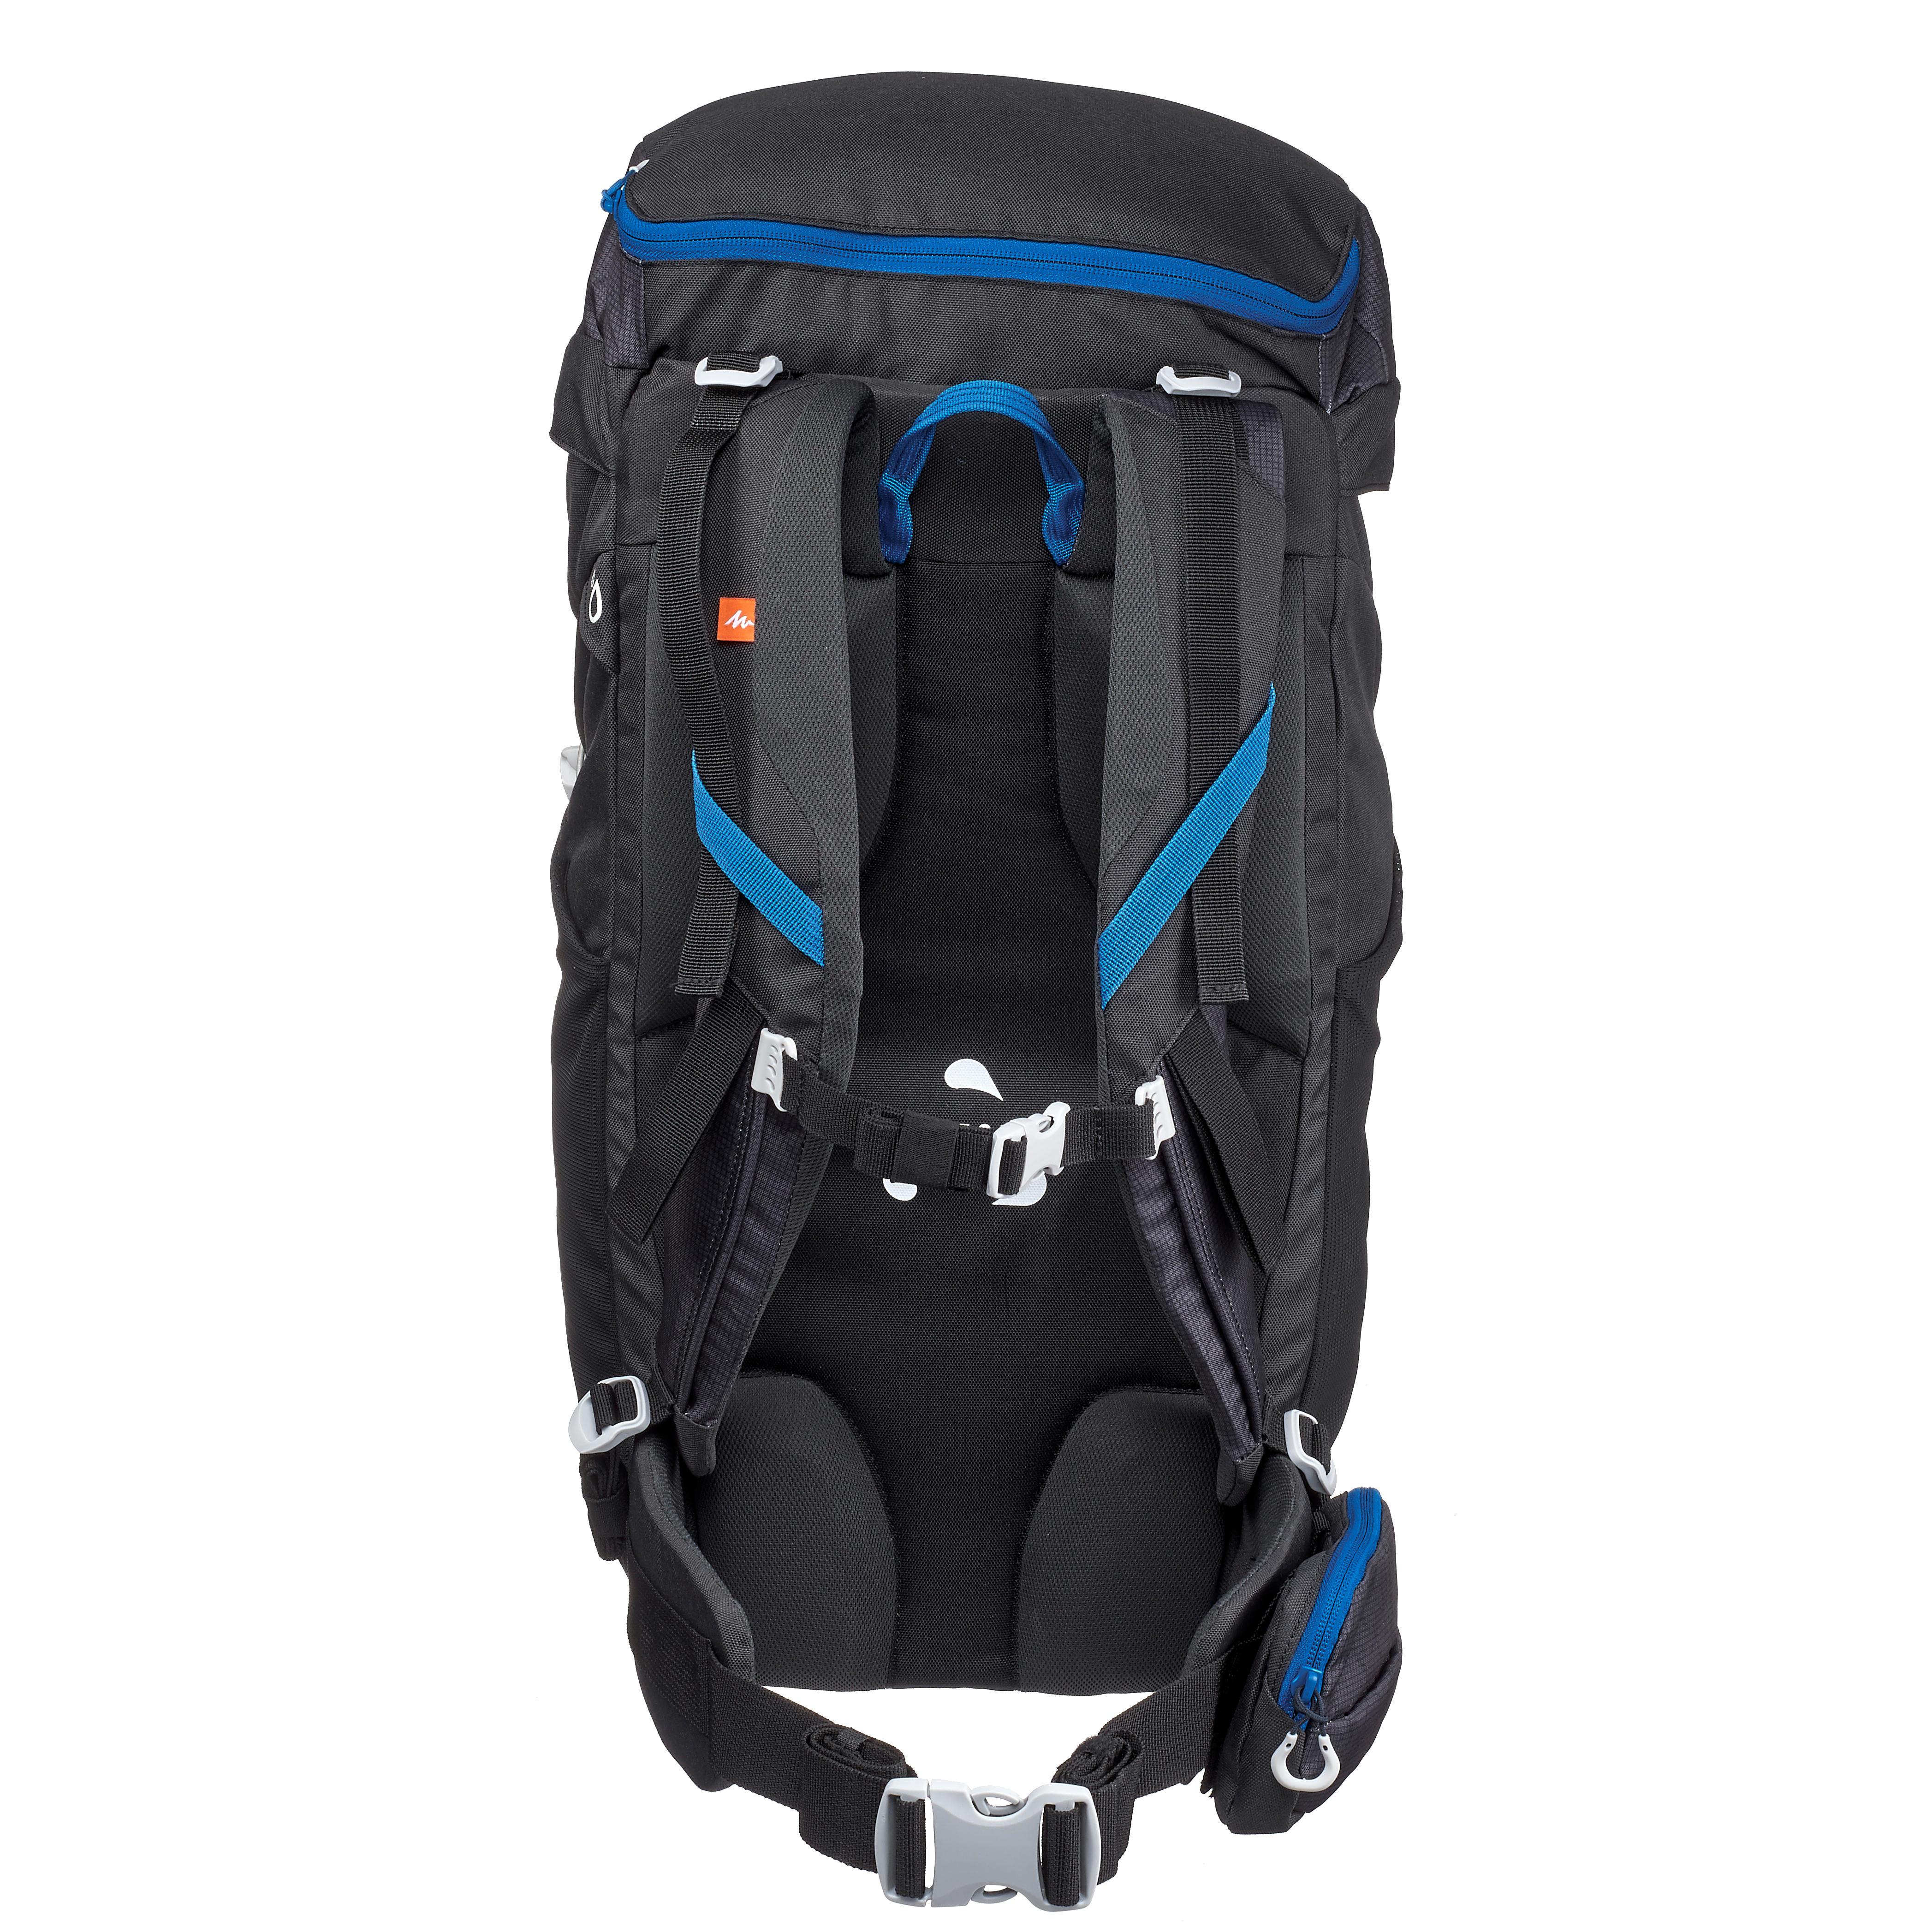 2x Grand Trecking Sac à Dos 75 L Randonnée Sport Sac à dos trekking sac à dos